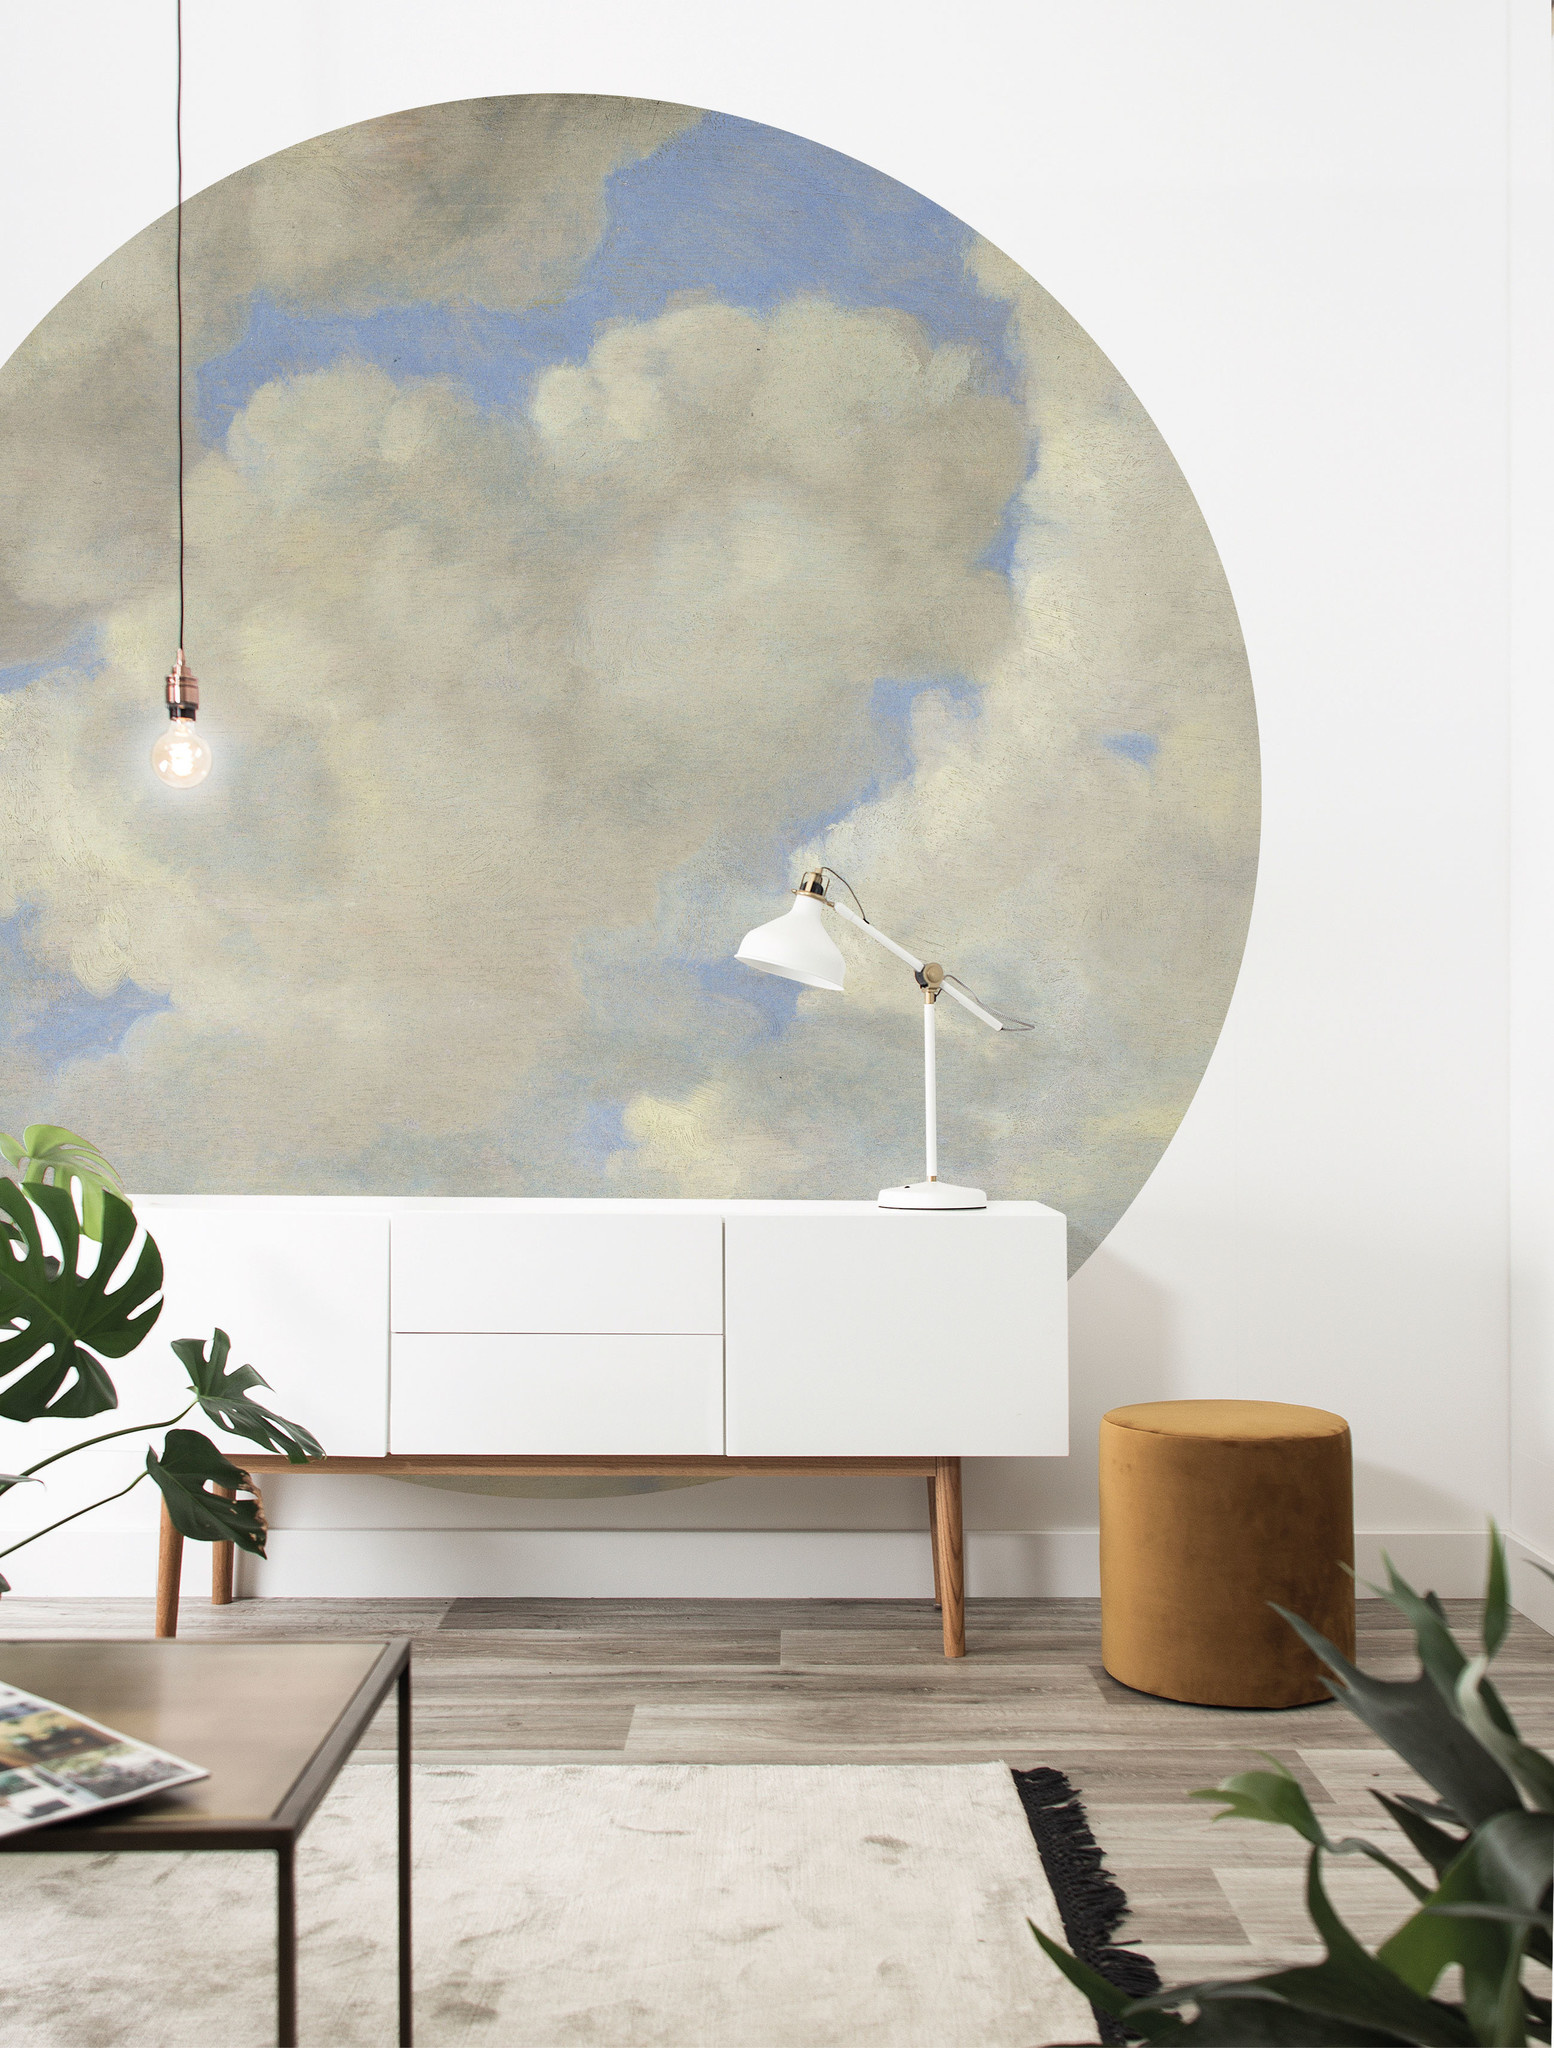 Behang Golden age clouds XL Round Ø237.5cm-2